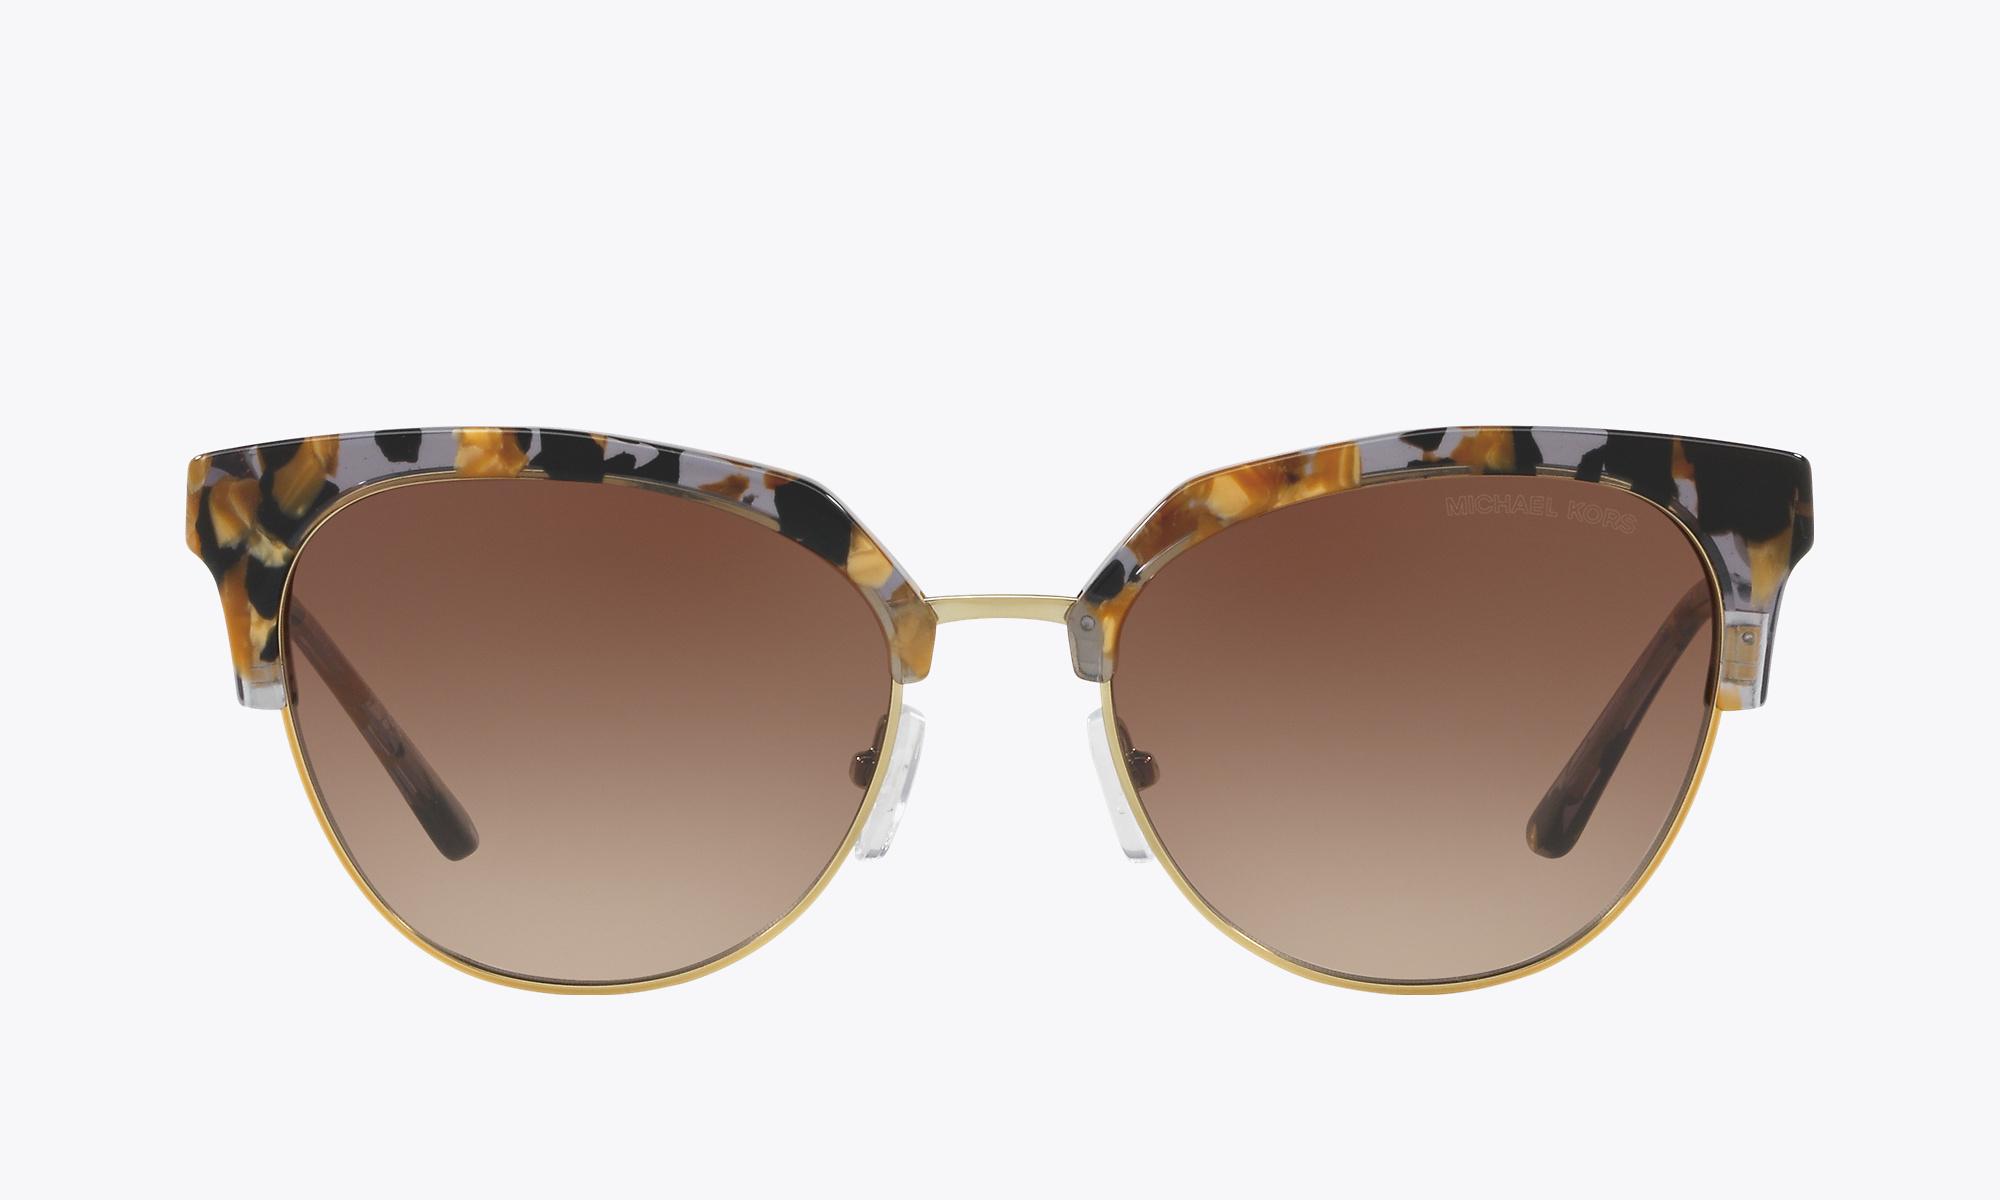 72ba073cf212 Michael Kors SAVANNAH | Glasses.com® | Free Shipping